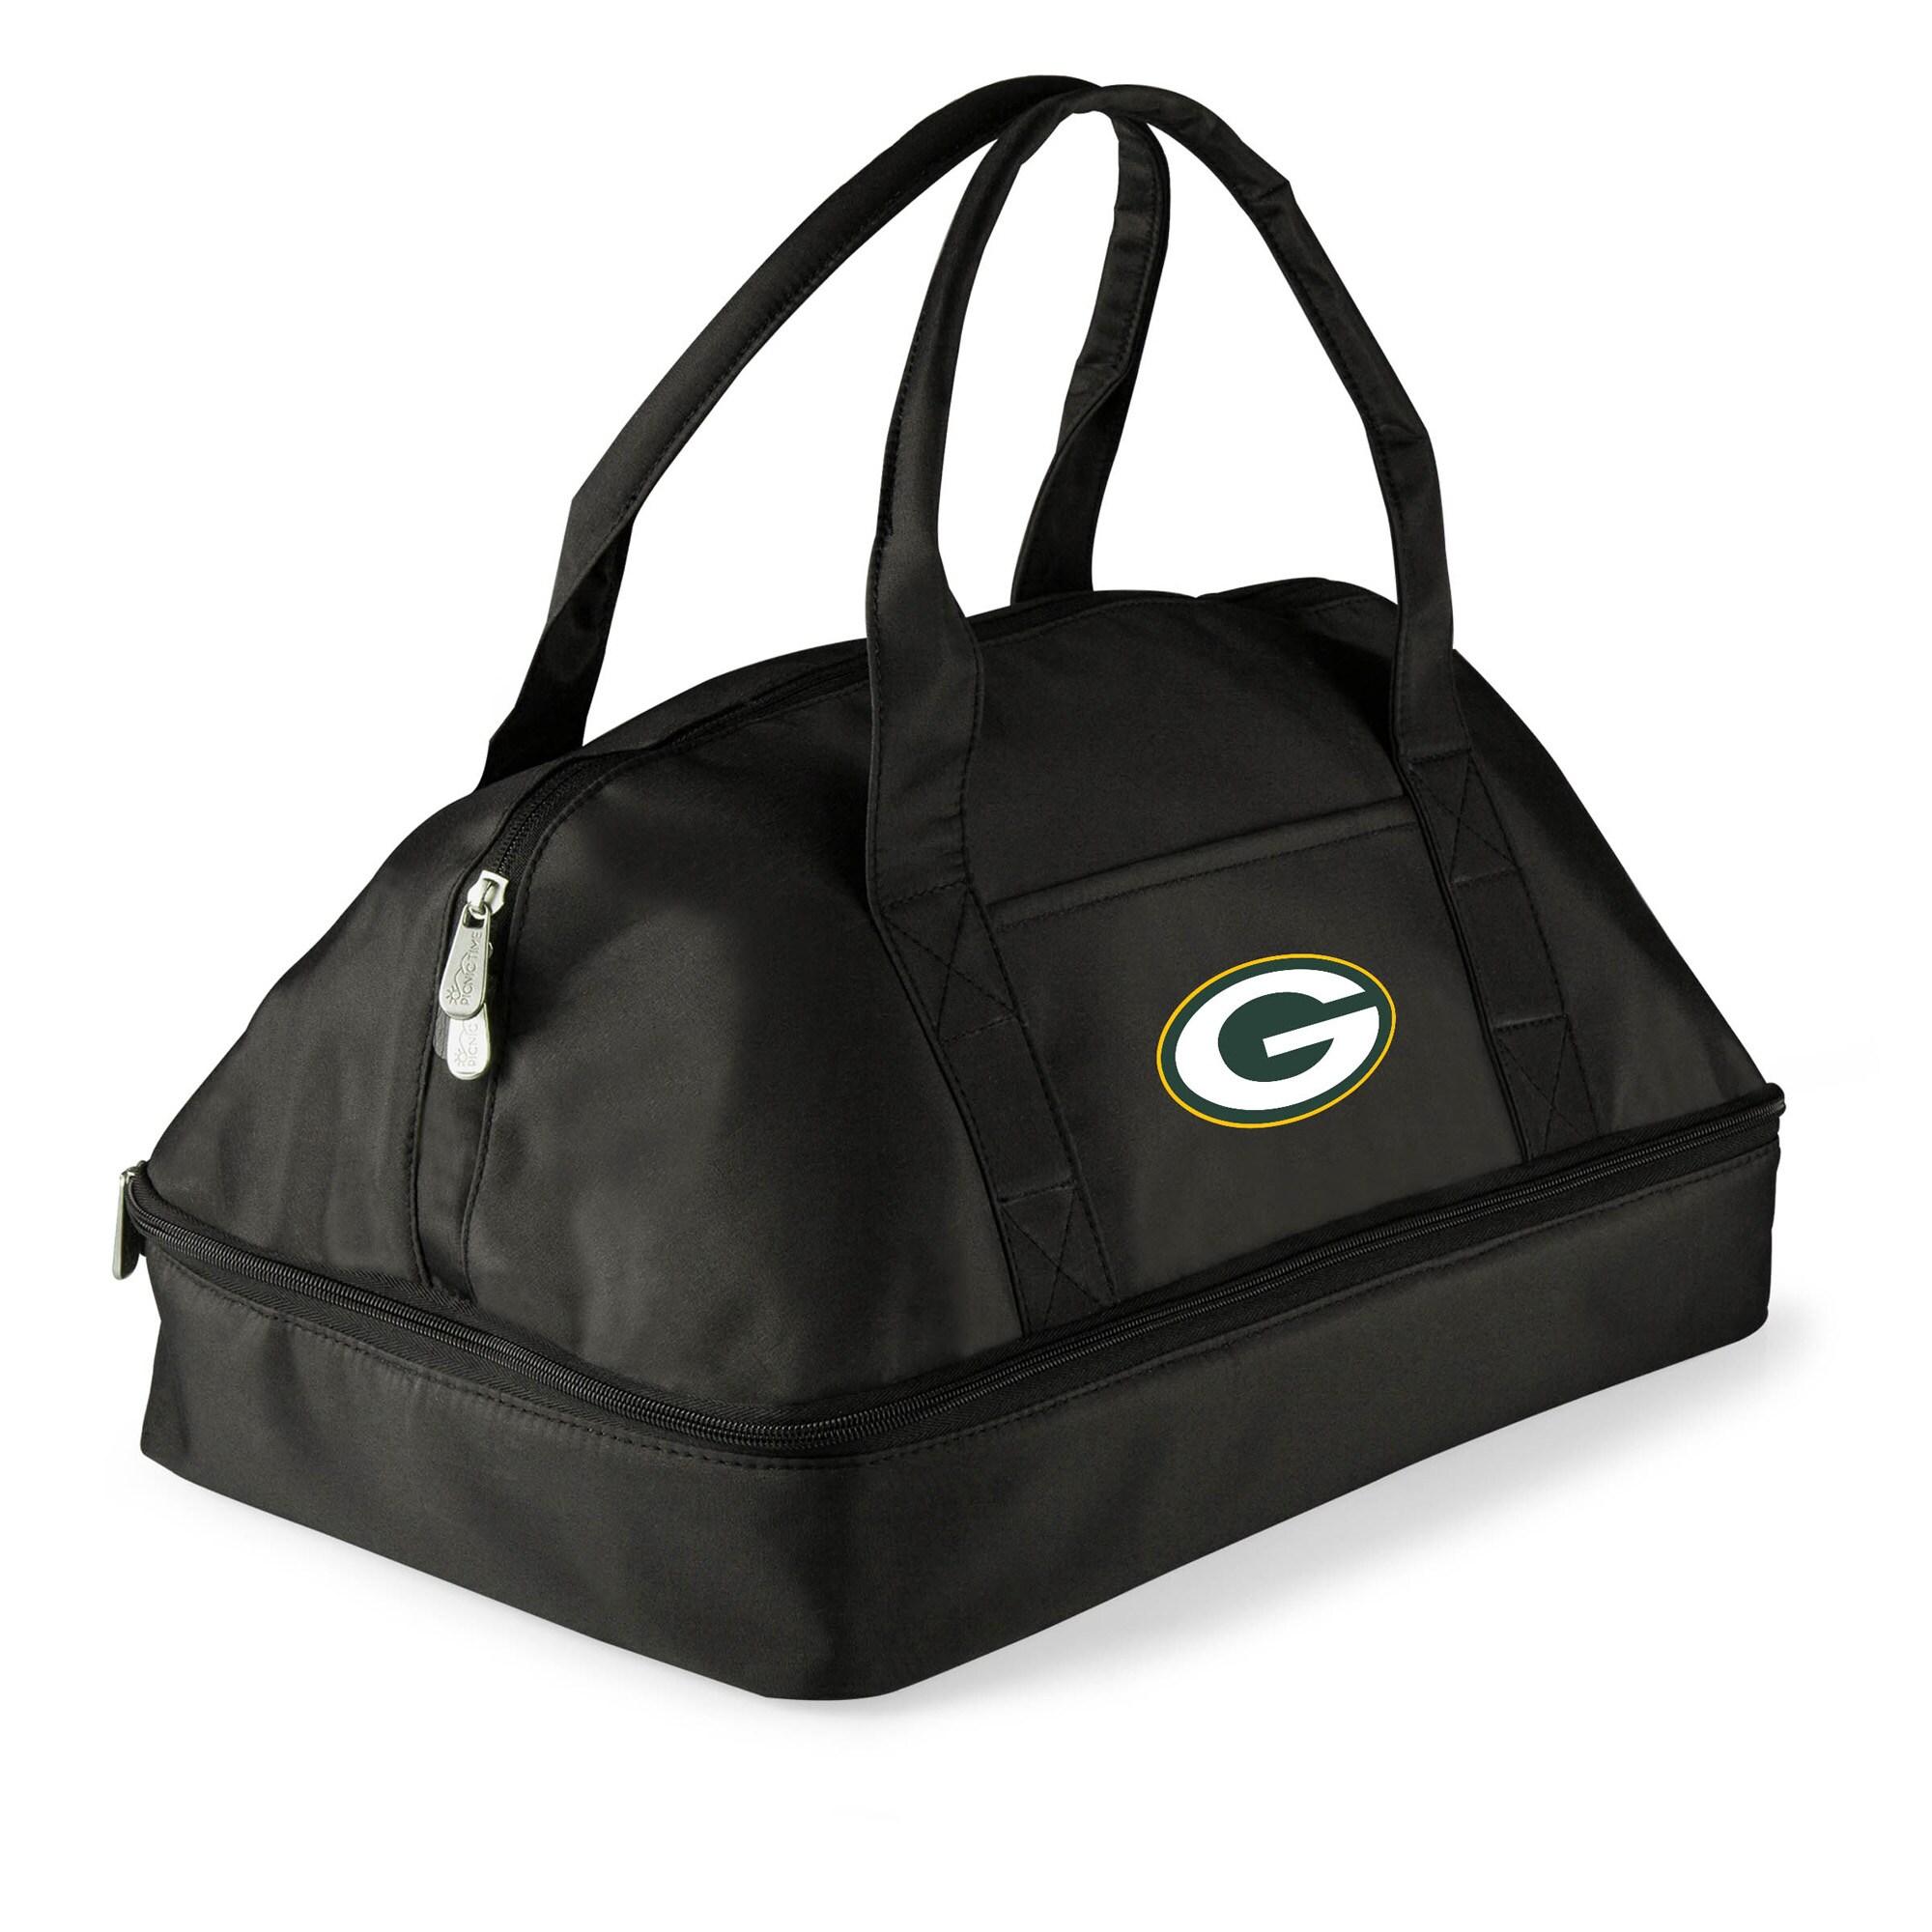 Green Bay Packers Potluck Casserole Tote - Black